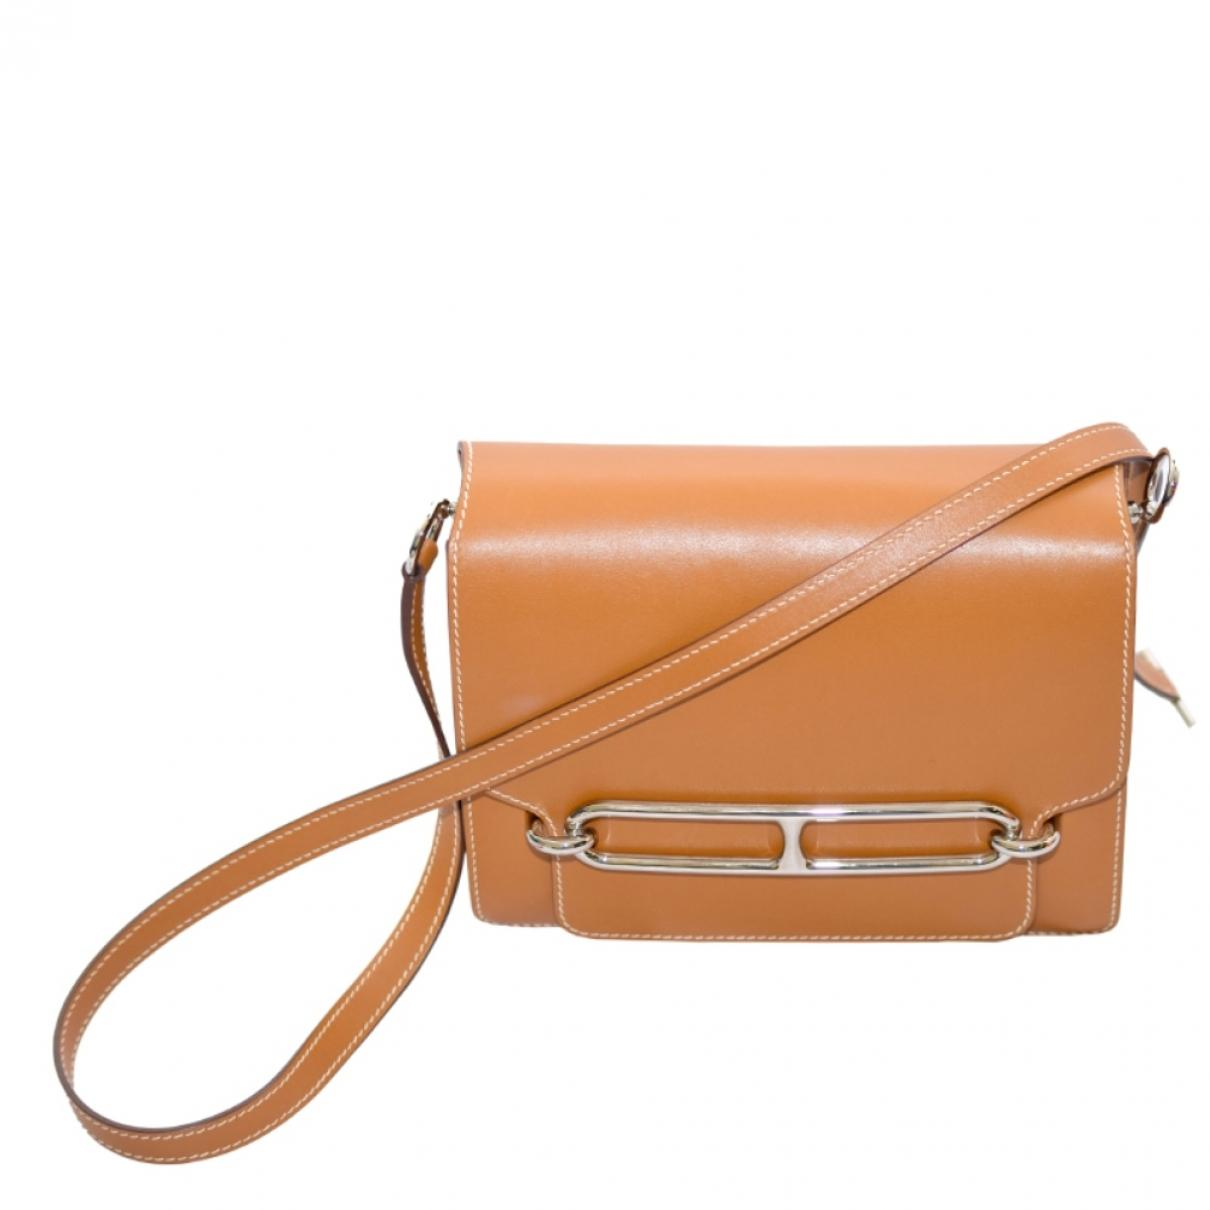 2e3946e06eb4 Lyst - Hermès Roulis Brown Leather Handbag in Brown